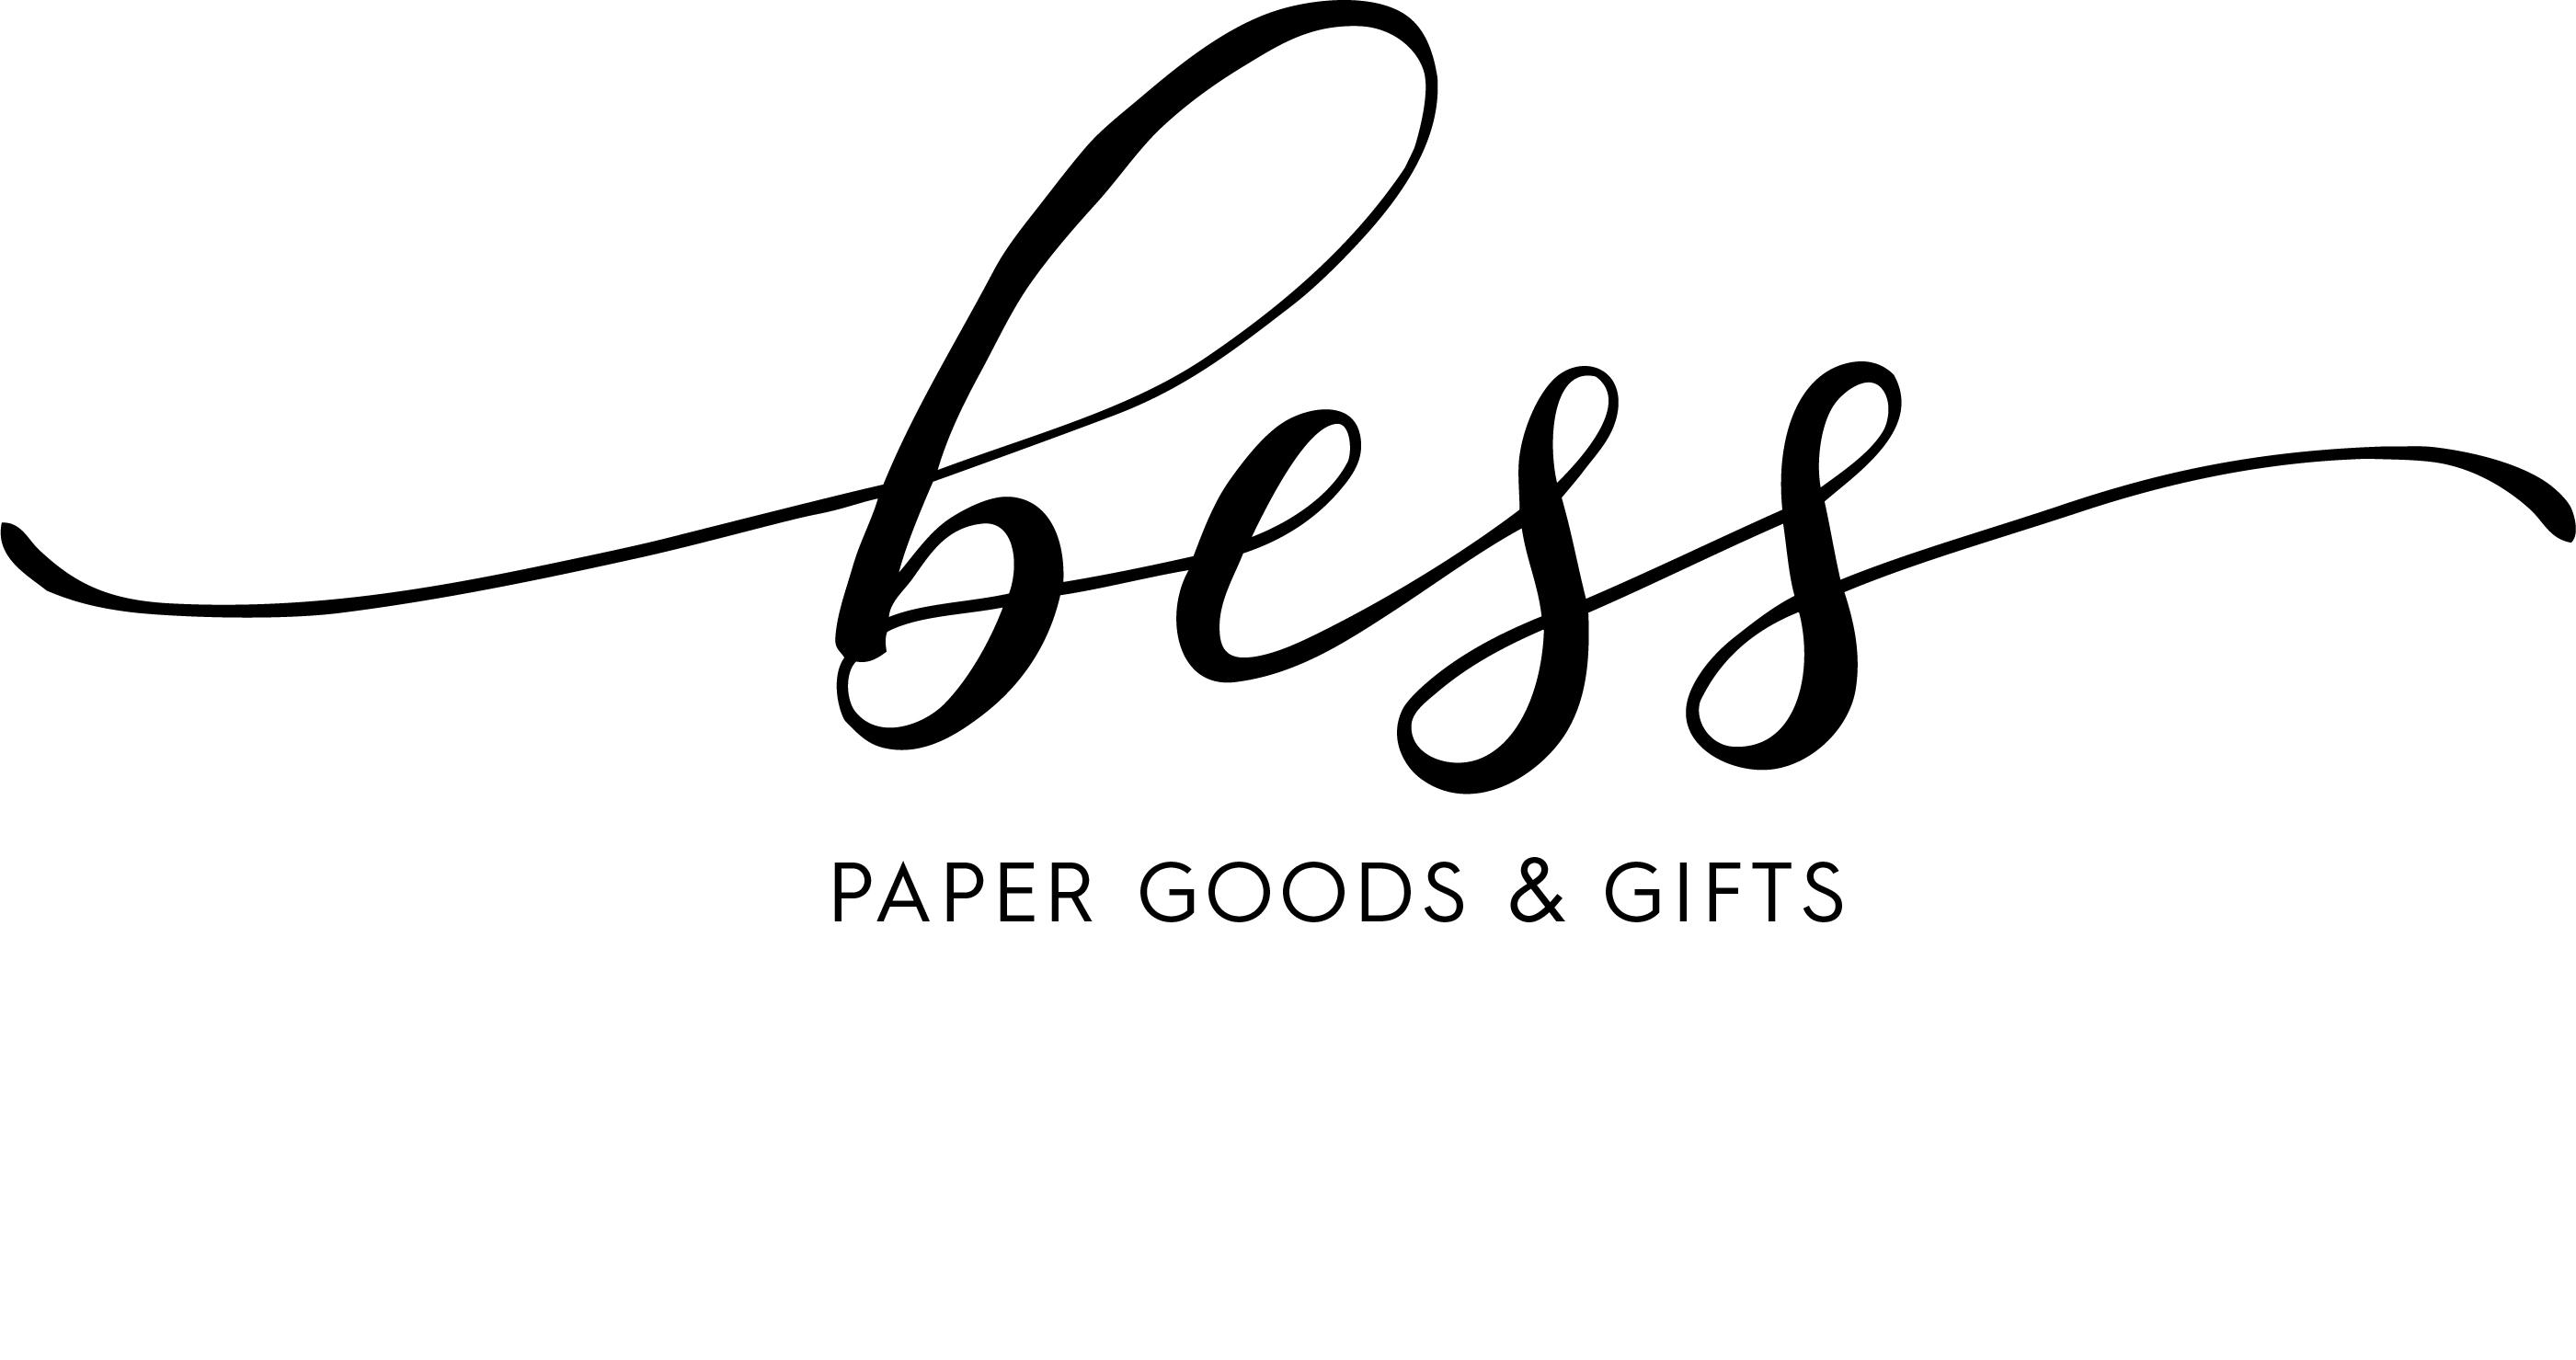 Bess Paper Goods & Gifts